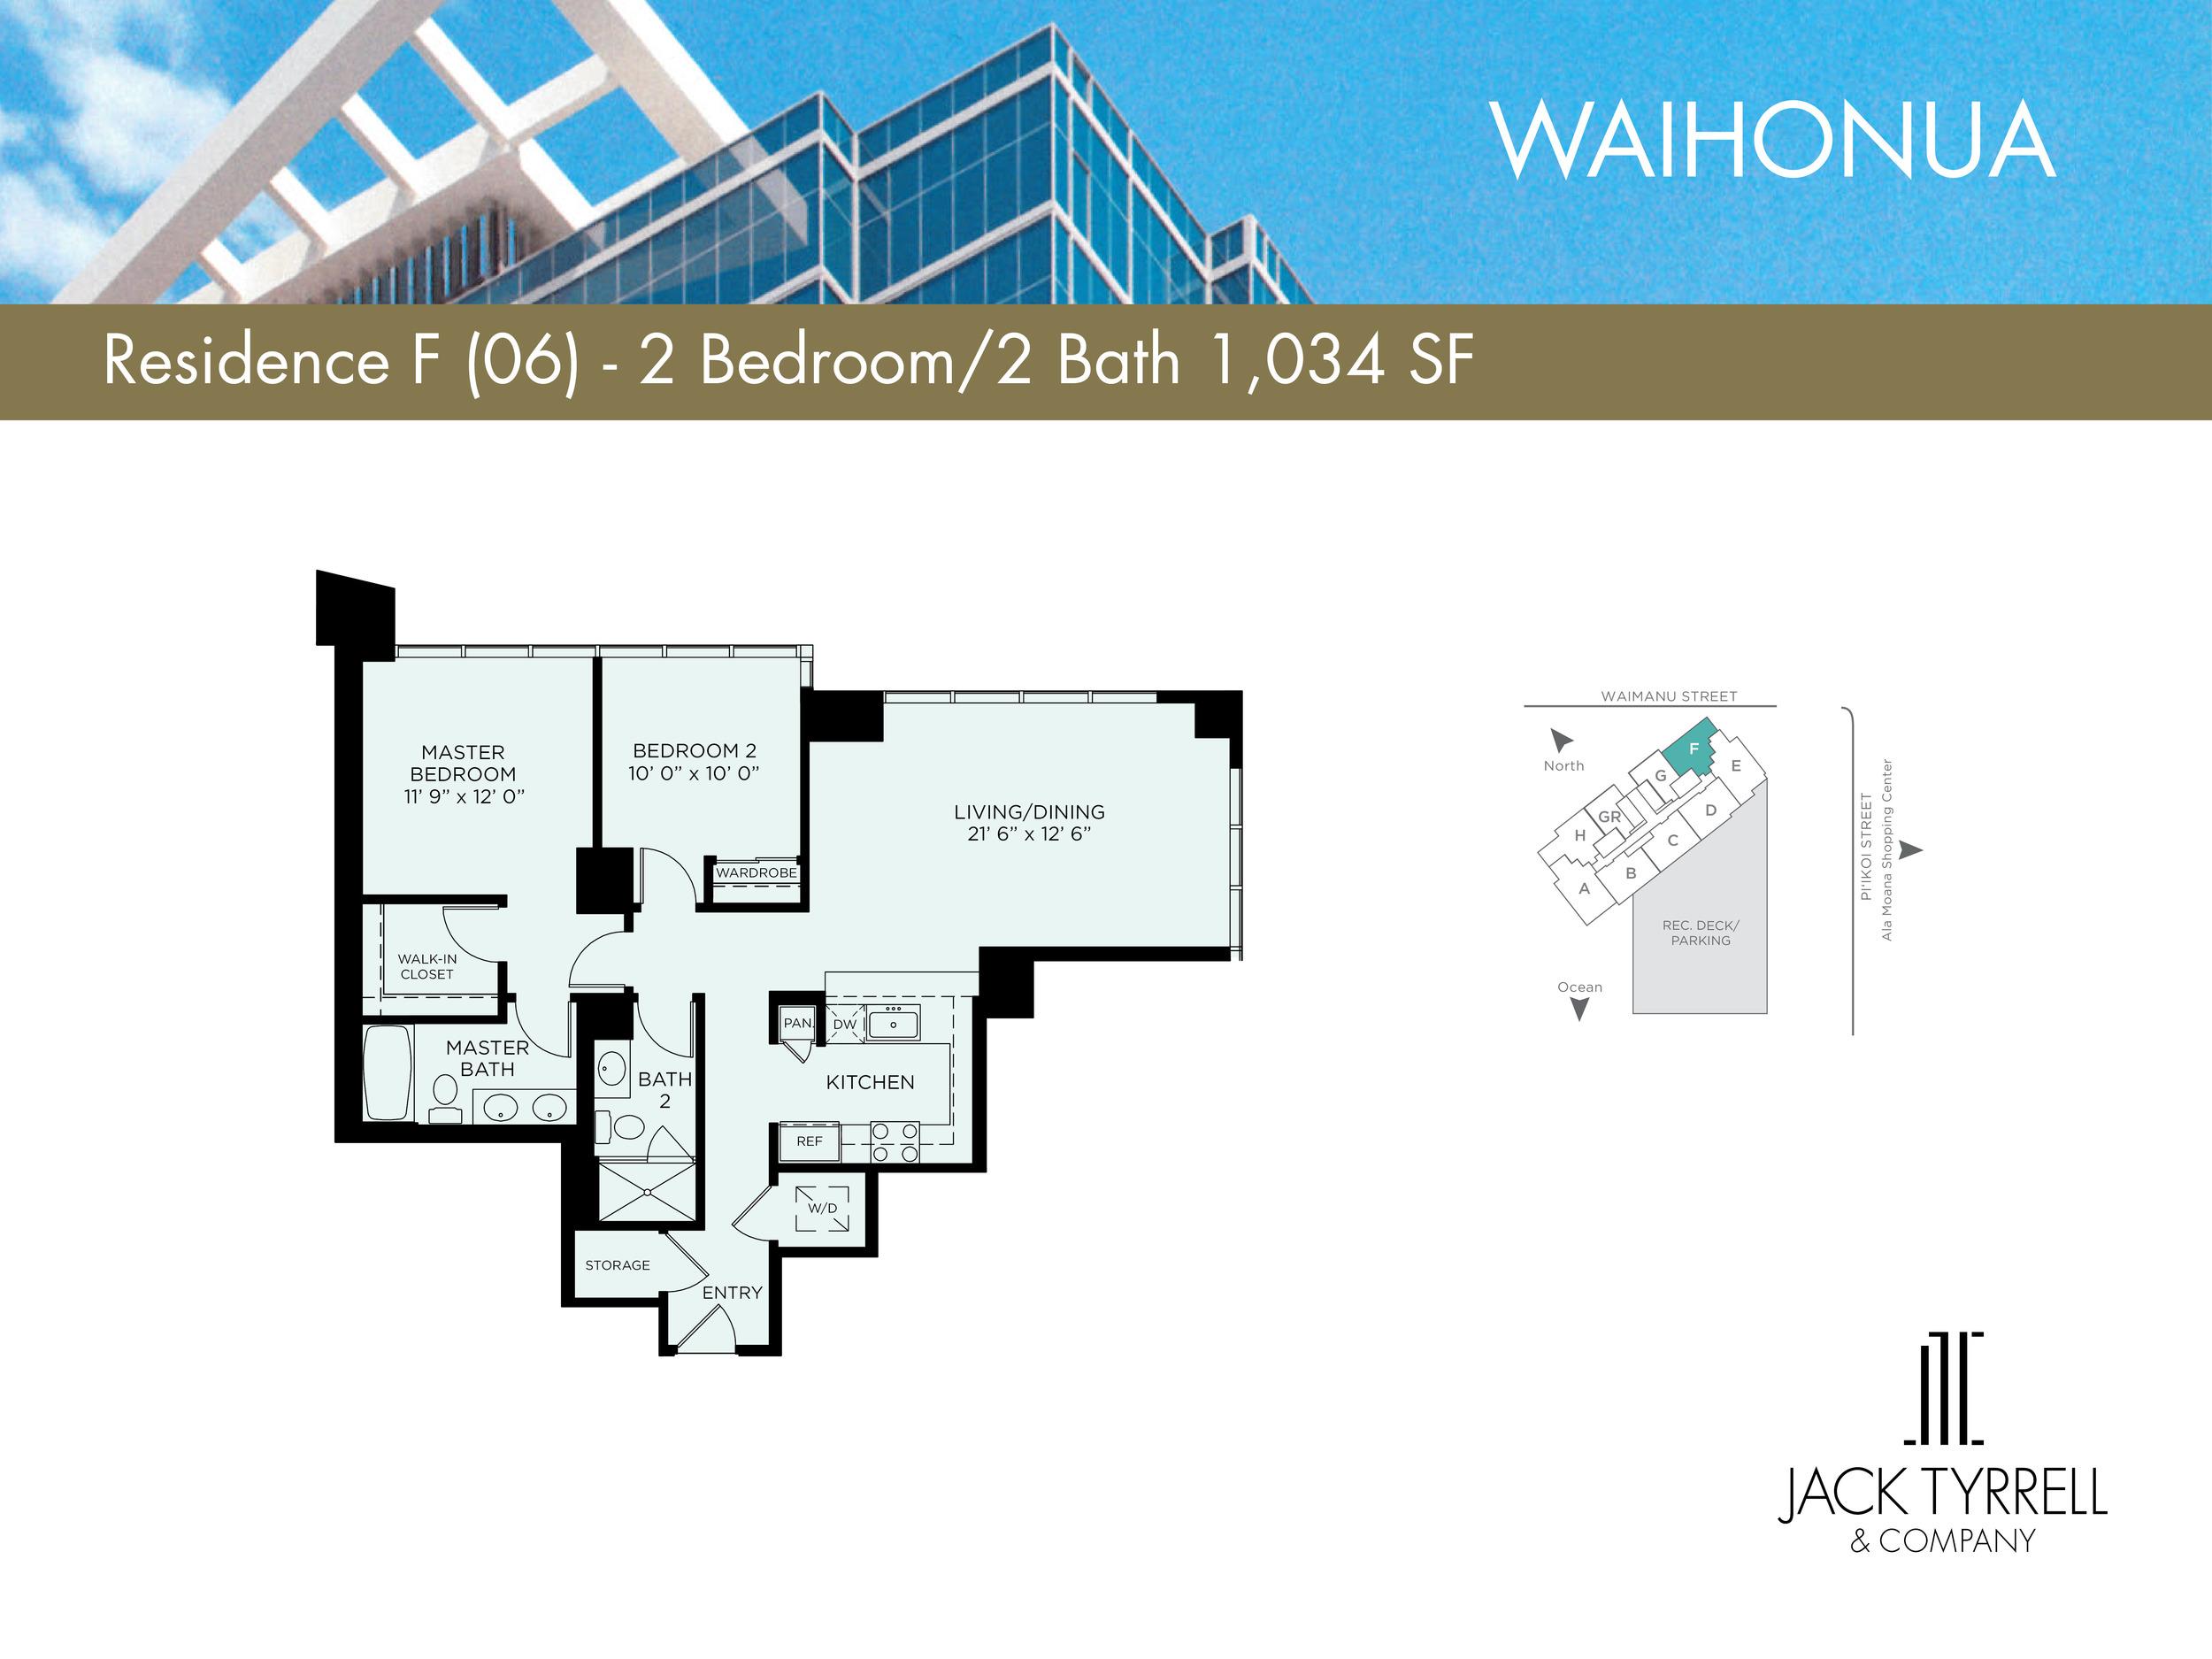 Waihonua 05 Unit (E) Floor Plan -Estimated Monthly Maintenance fee is $899.73